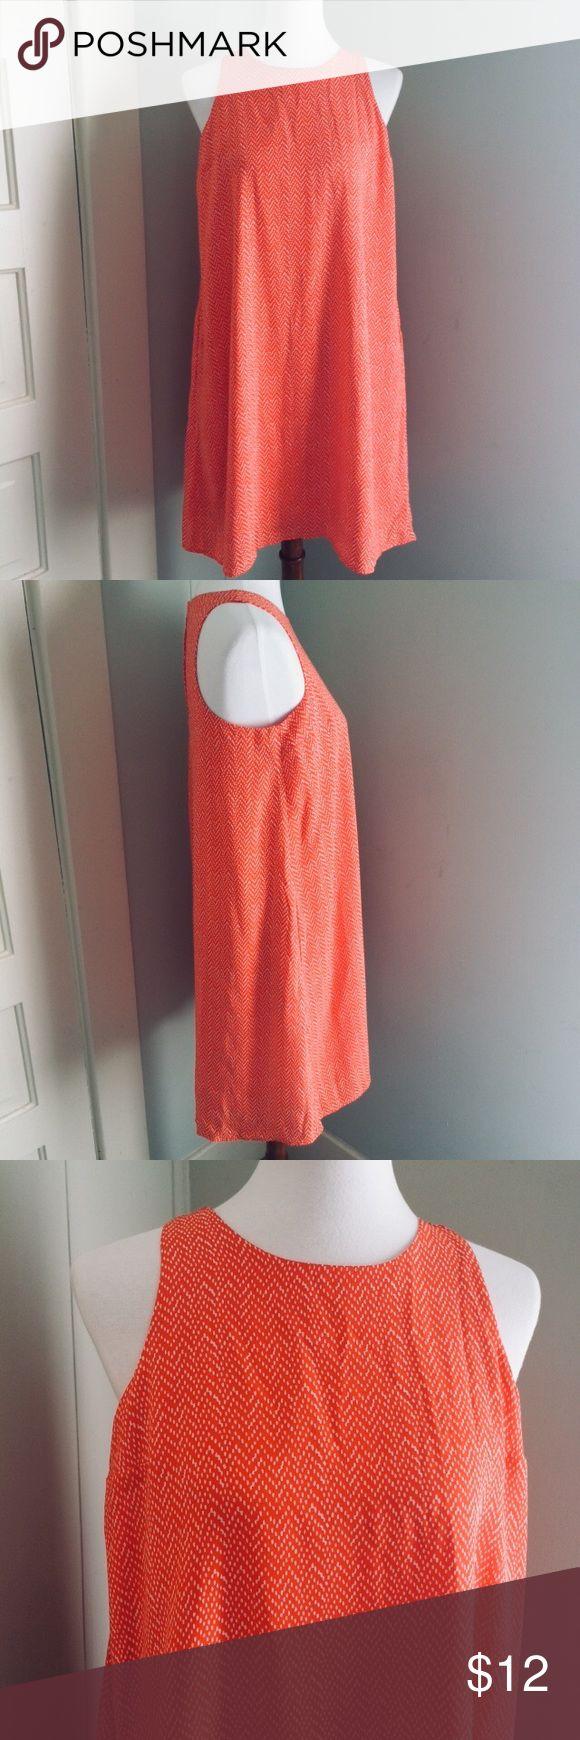 "Gap dress Beautiful orange dress!  Fully lined and has pockets.   Armpit to armpit - 18"" Top of strap to hem - 36"" GAP Dresses"